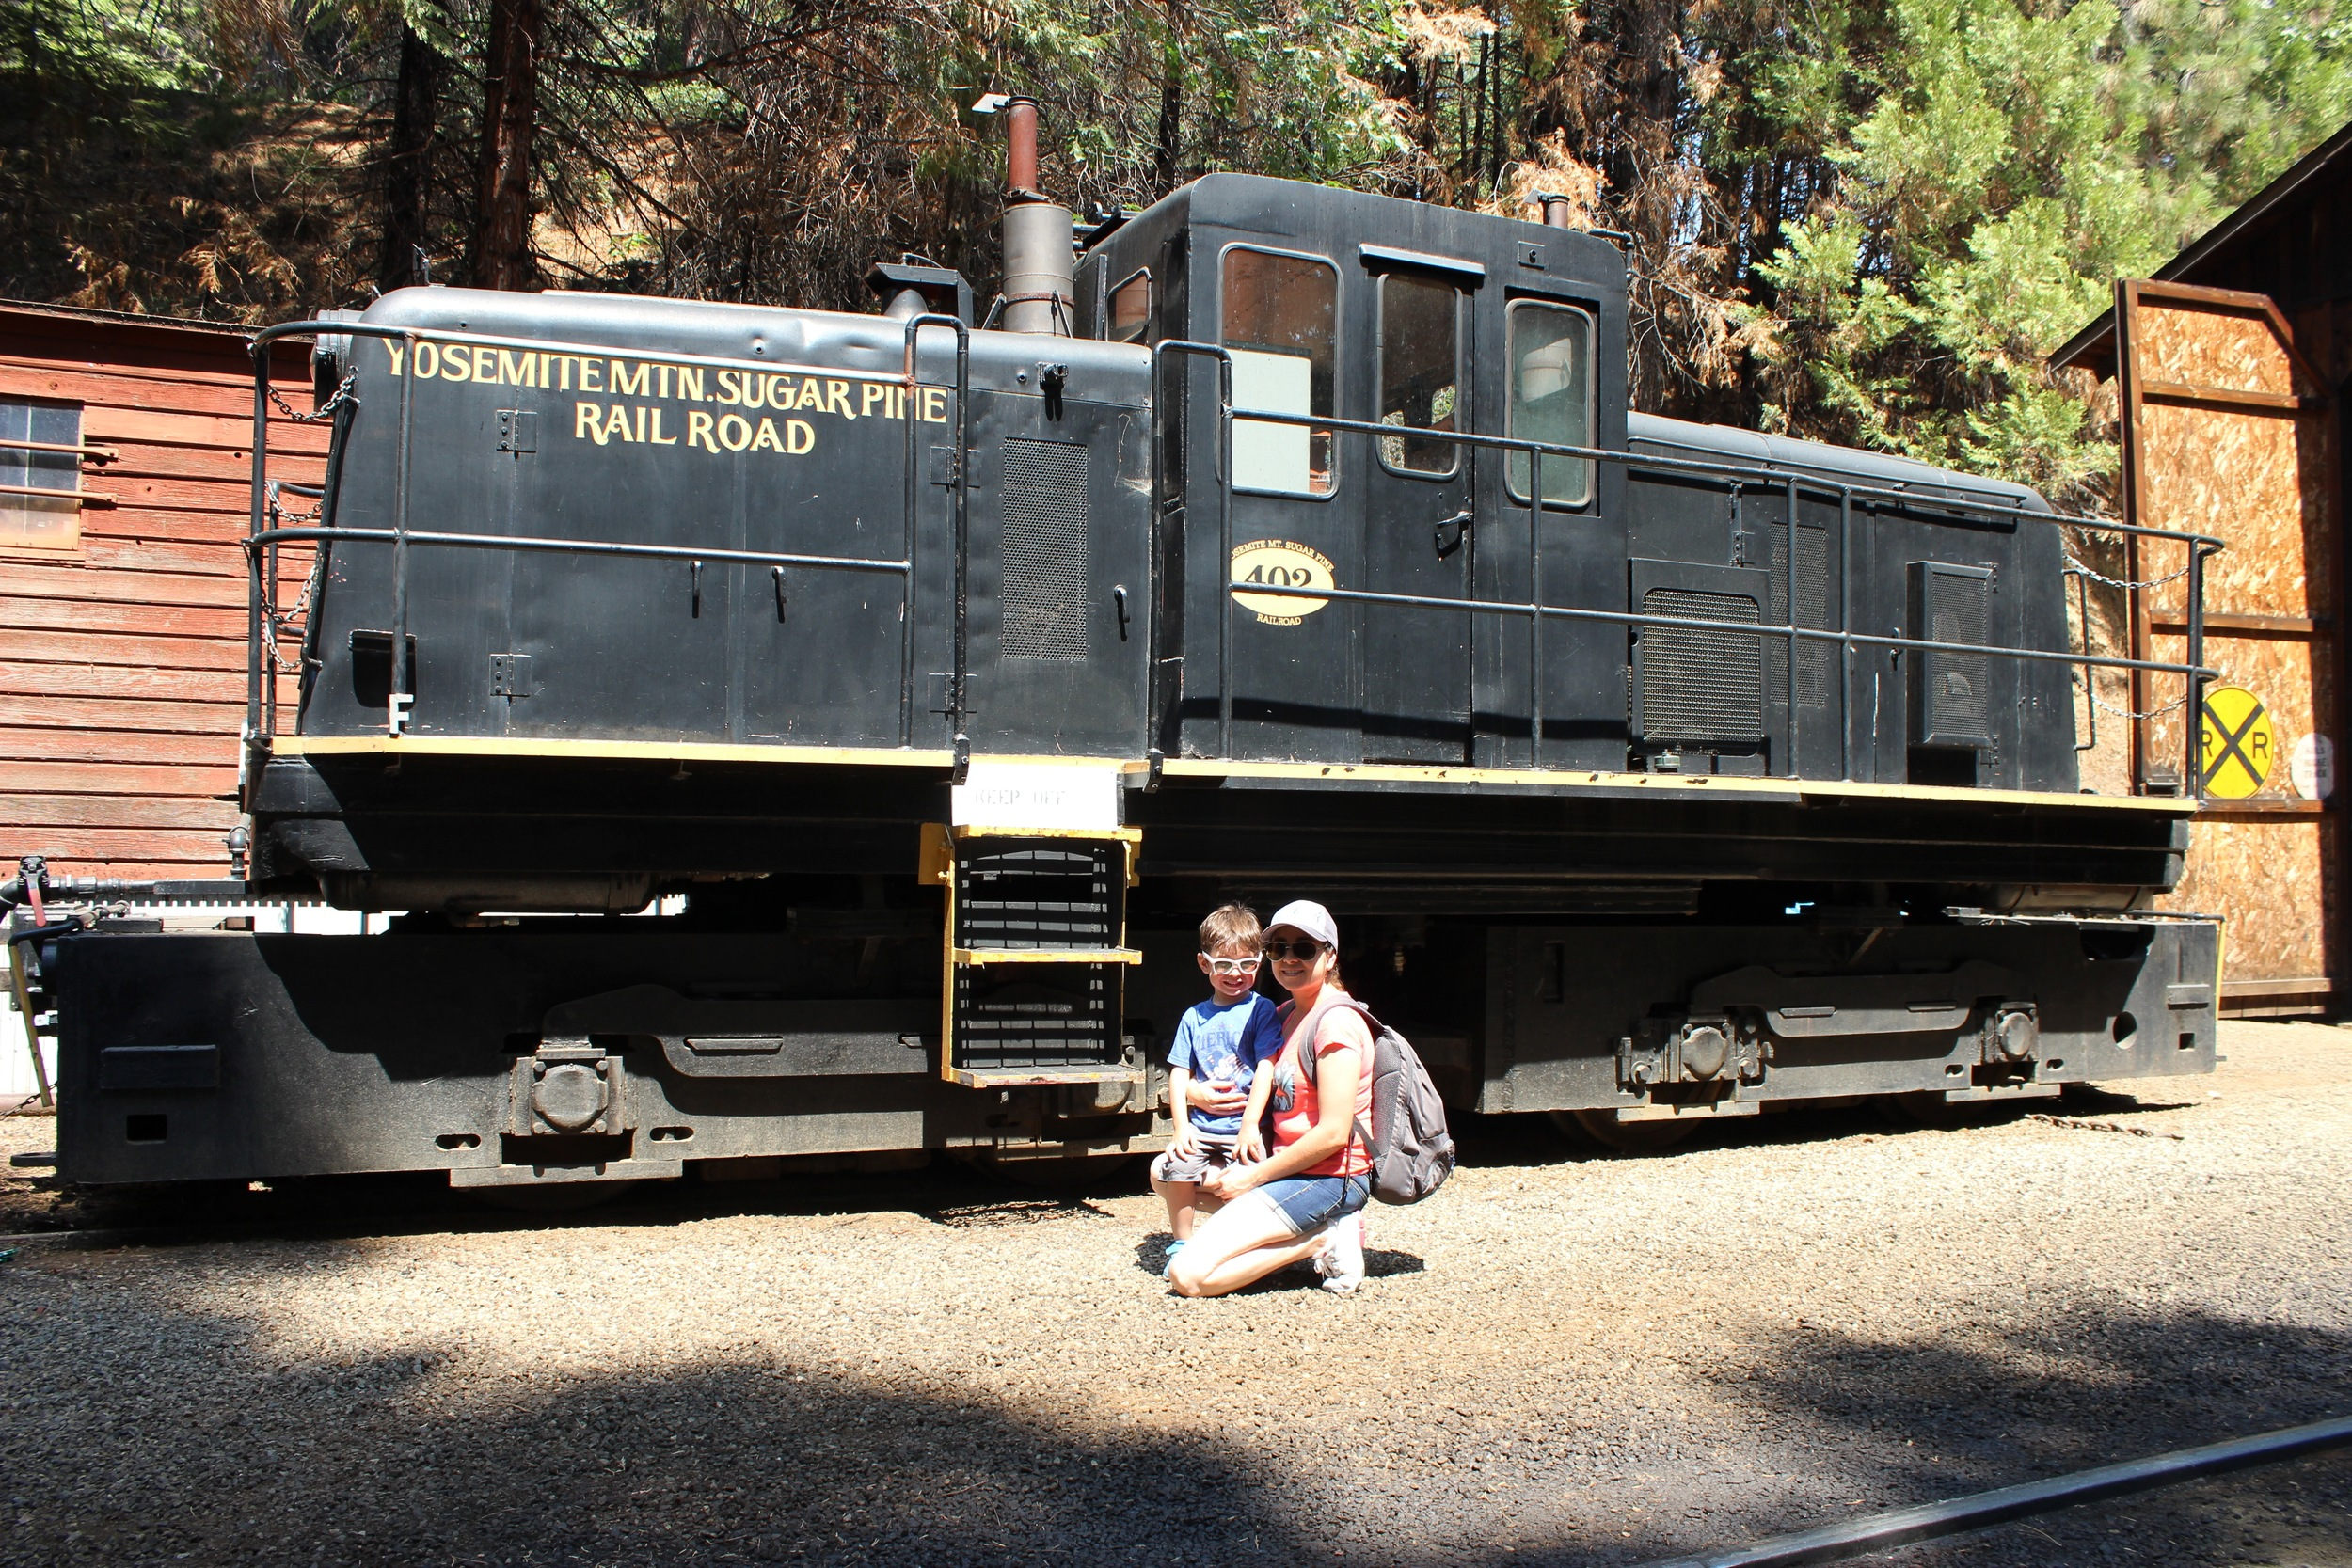 Coarsegold_Ca_KOA_Camping August_201577.jpg